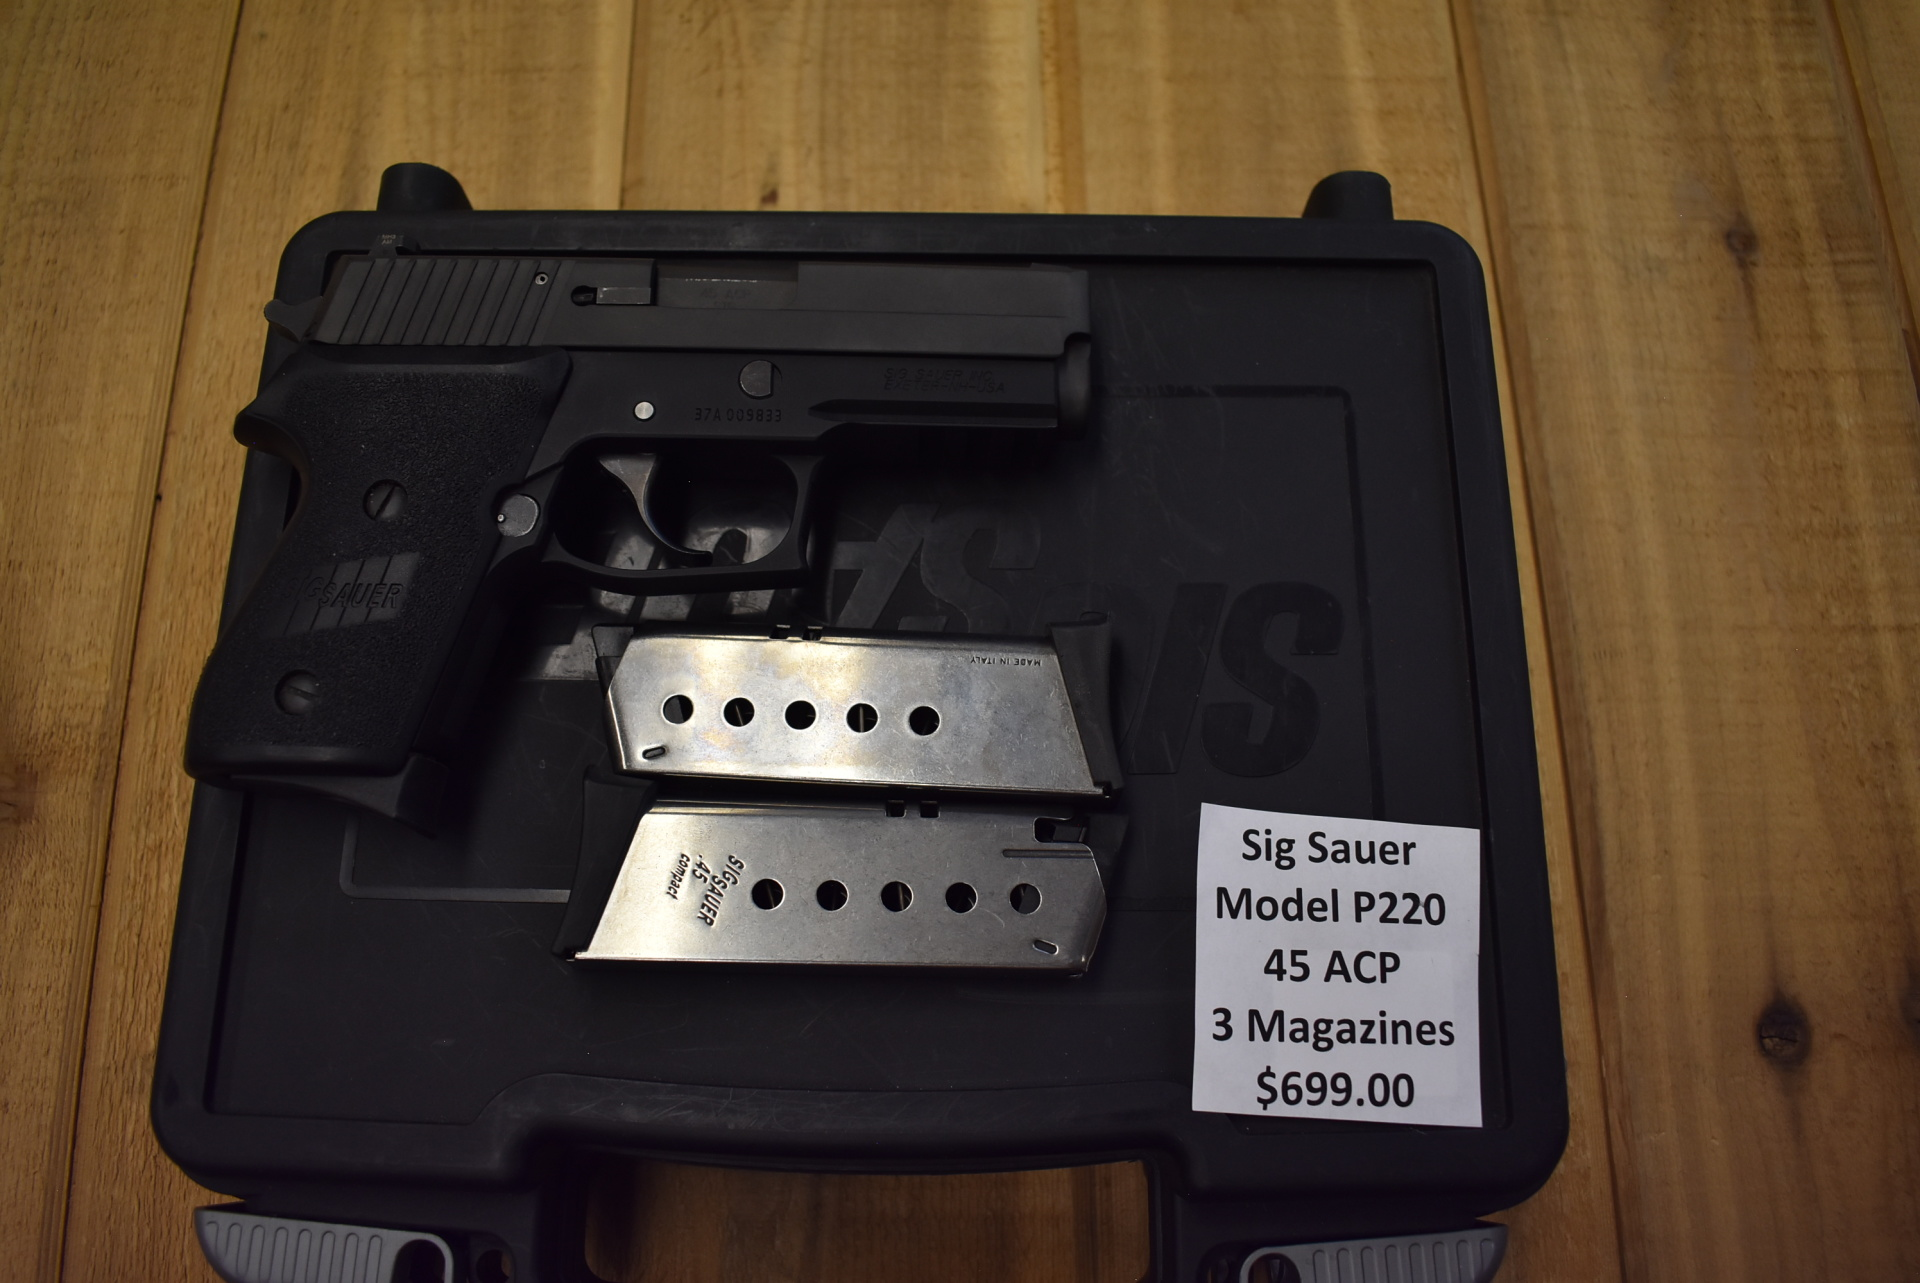 Sig Sauer Model P220